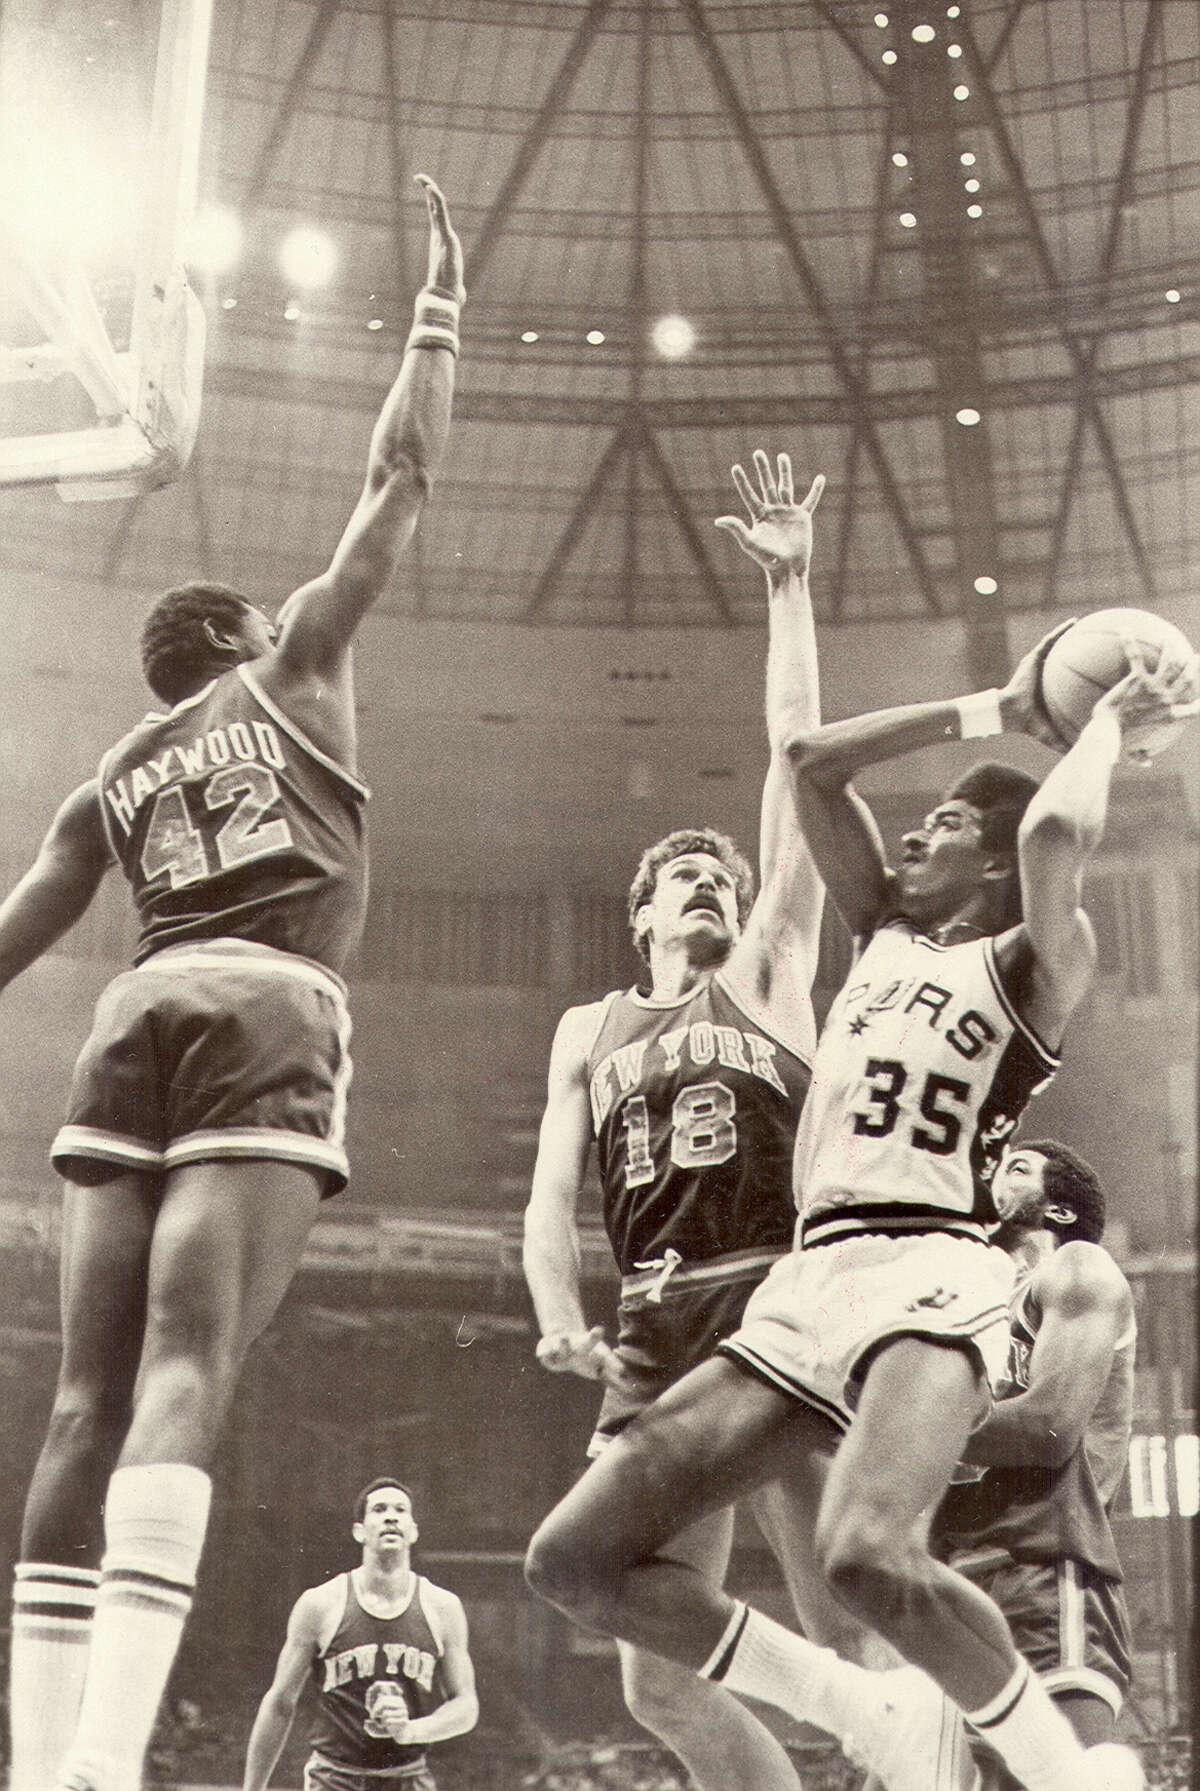 Larry Kenon vs. the NY Knicks in 1978 action at the HemisFair Arena.